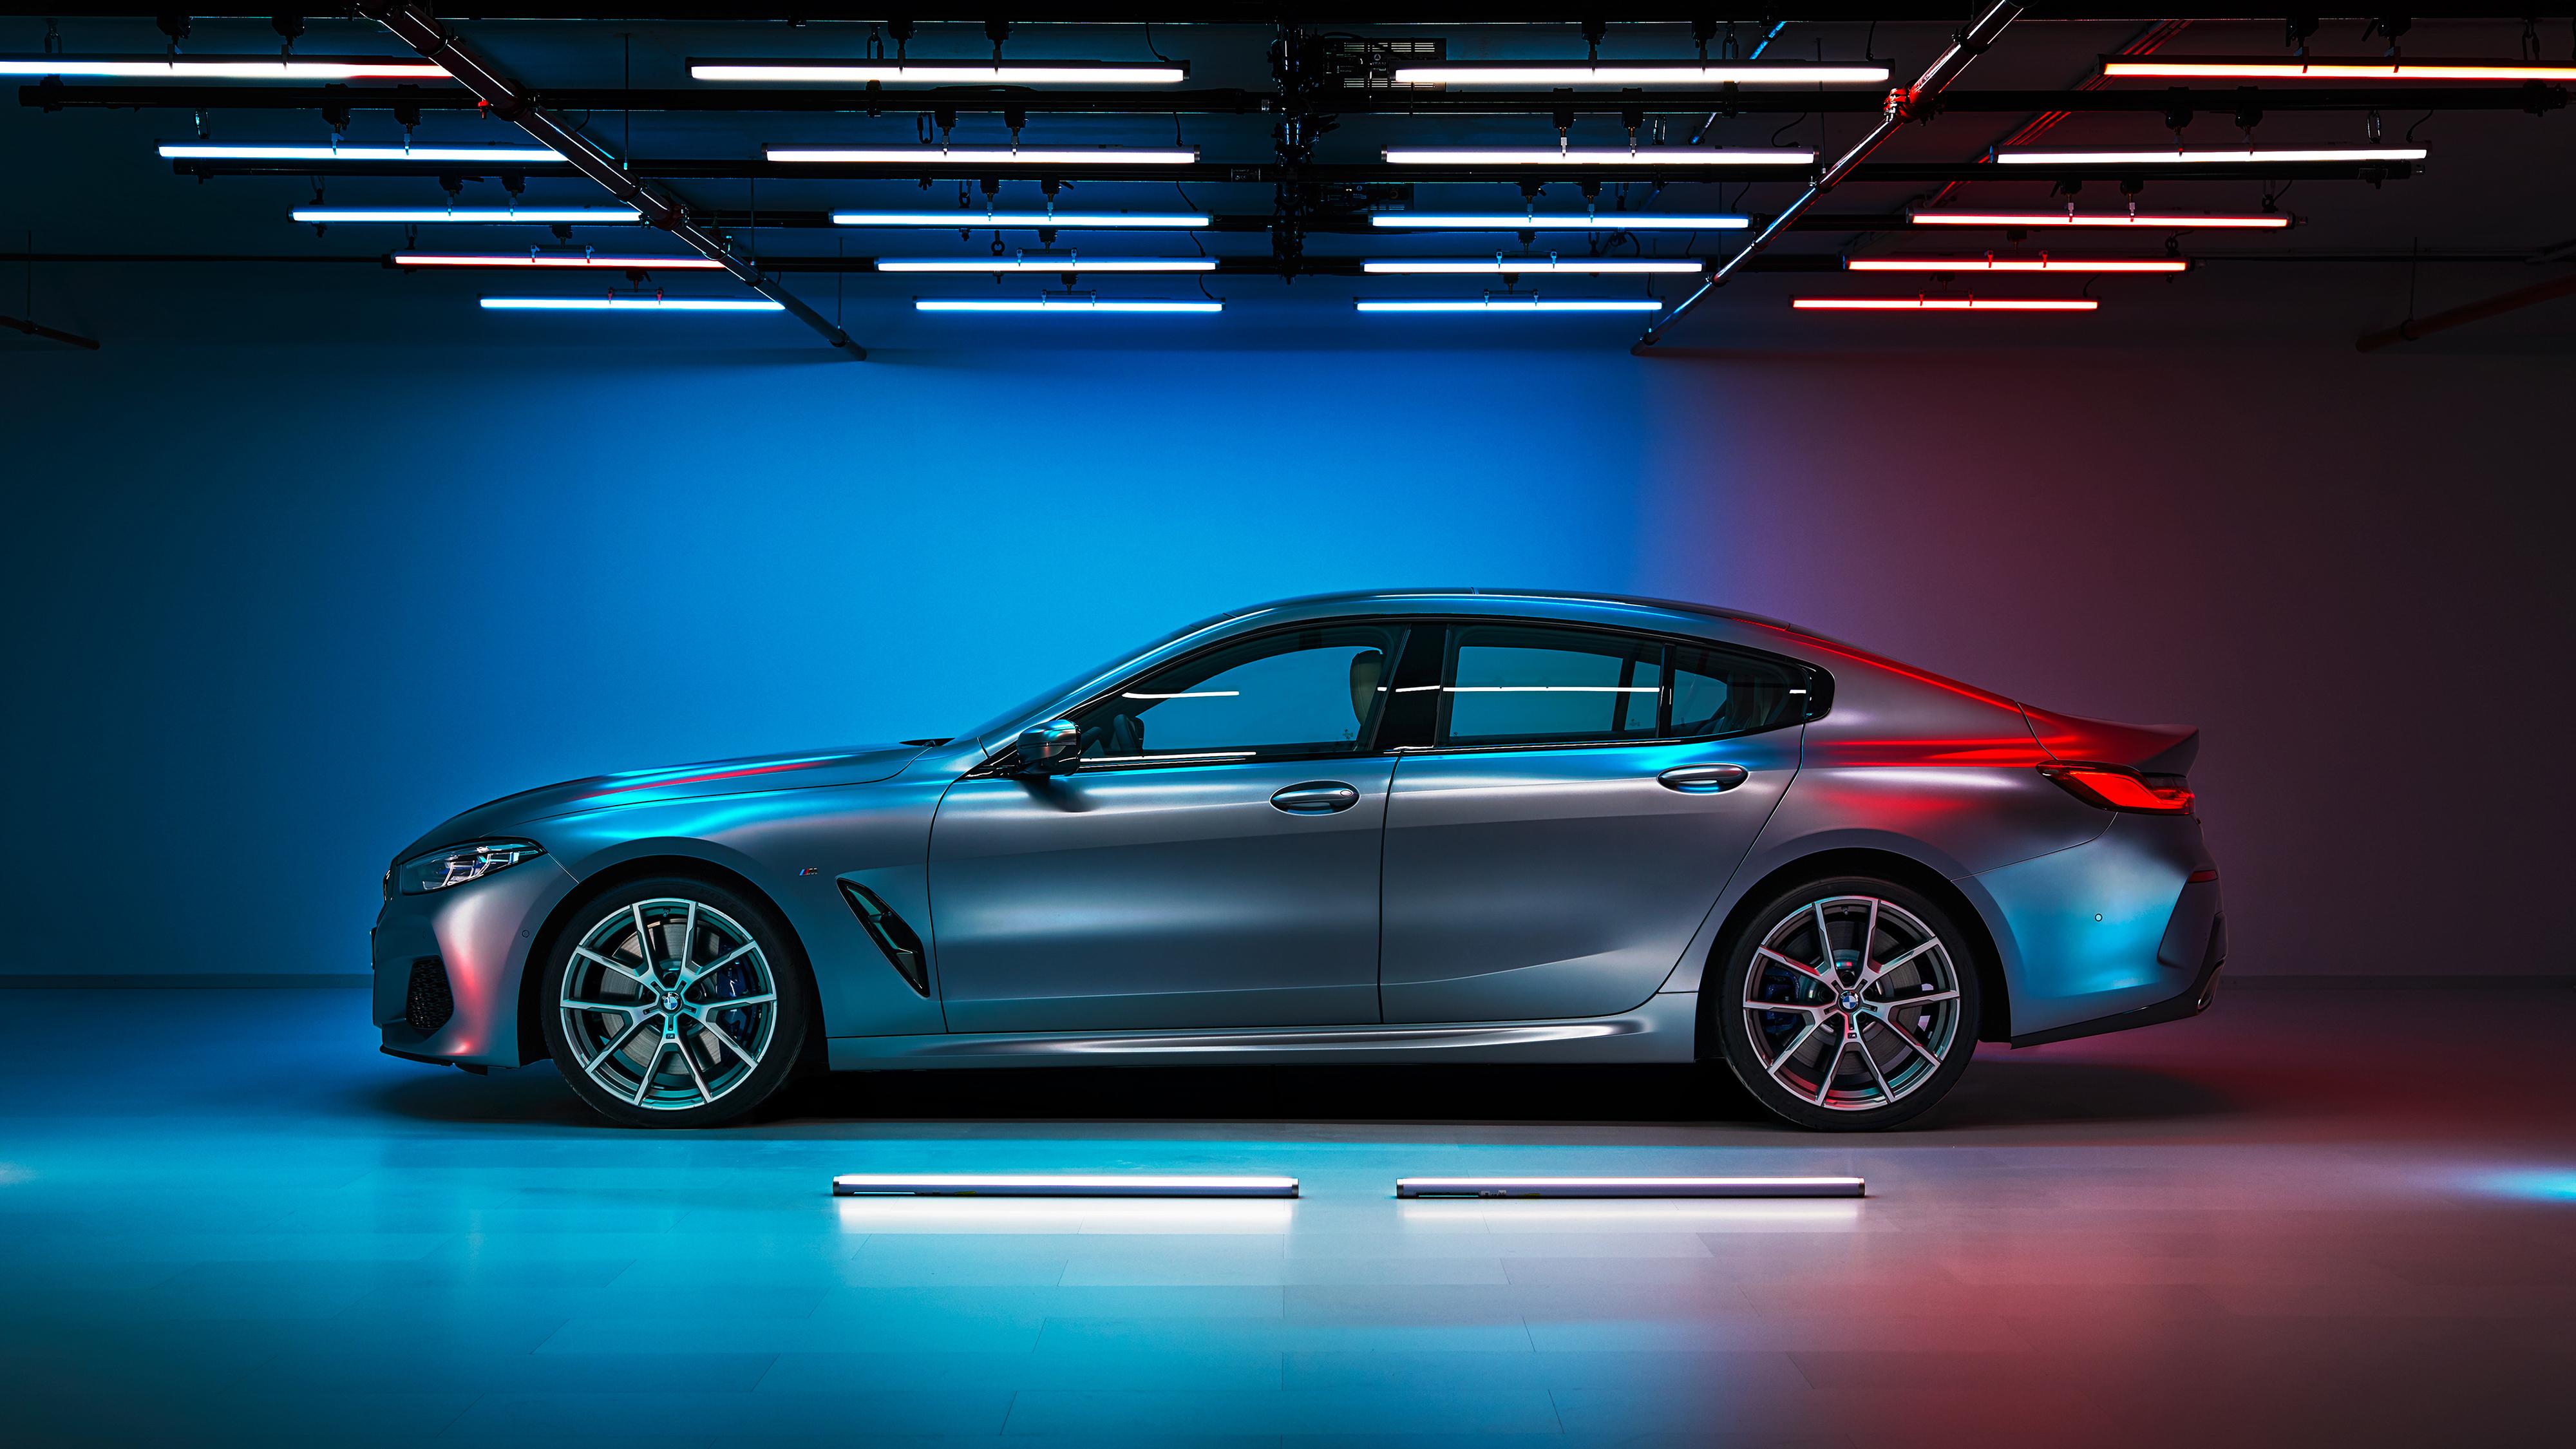 Bmw M850i Xdrive Gran Coupe 2019 4k 3 Wallpaper Hd Car Wallpapers Id 12776